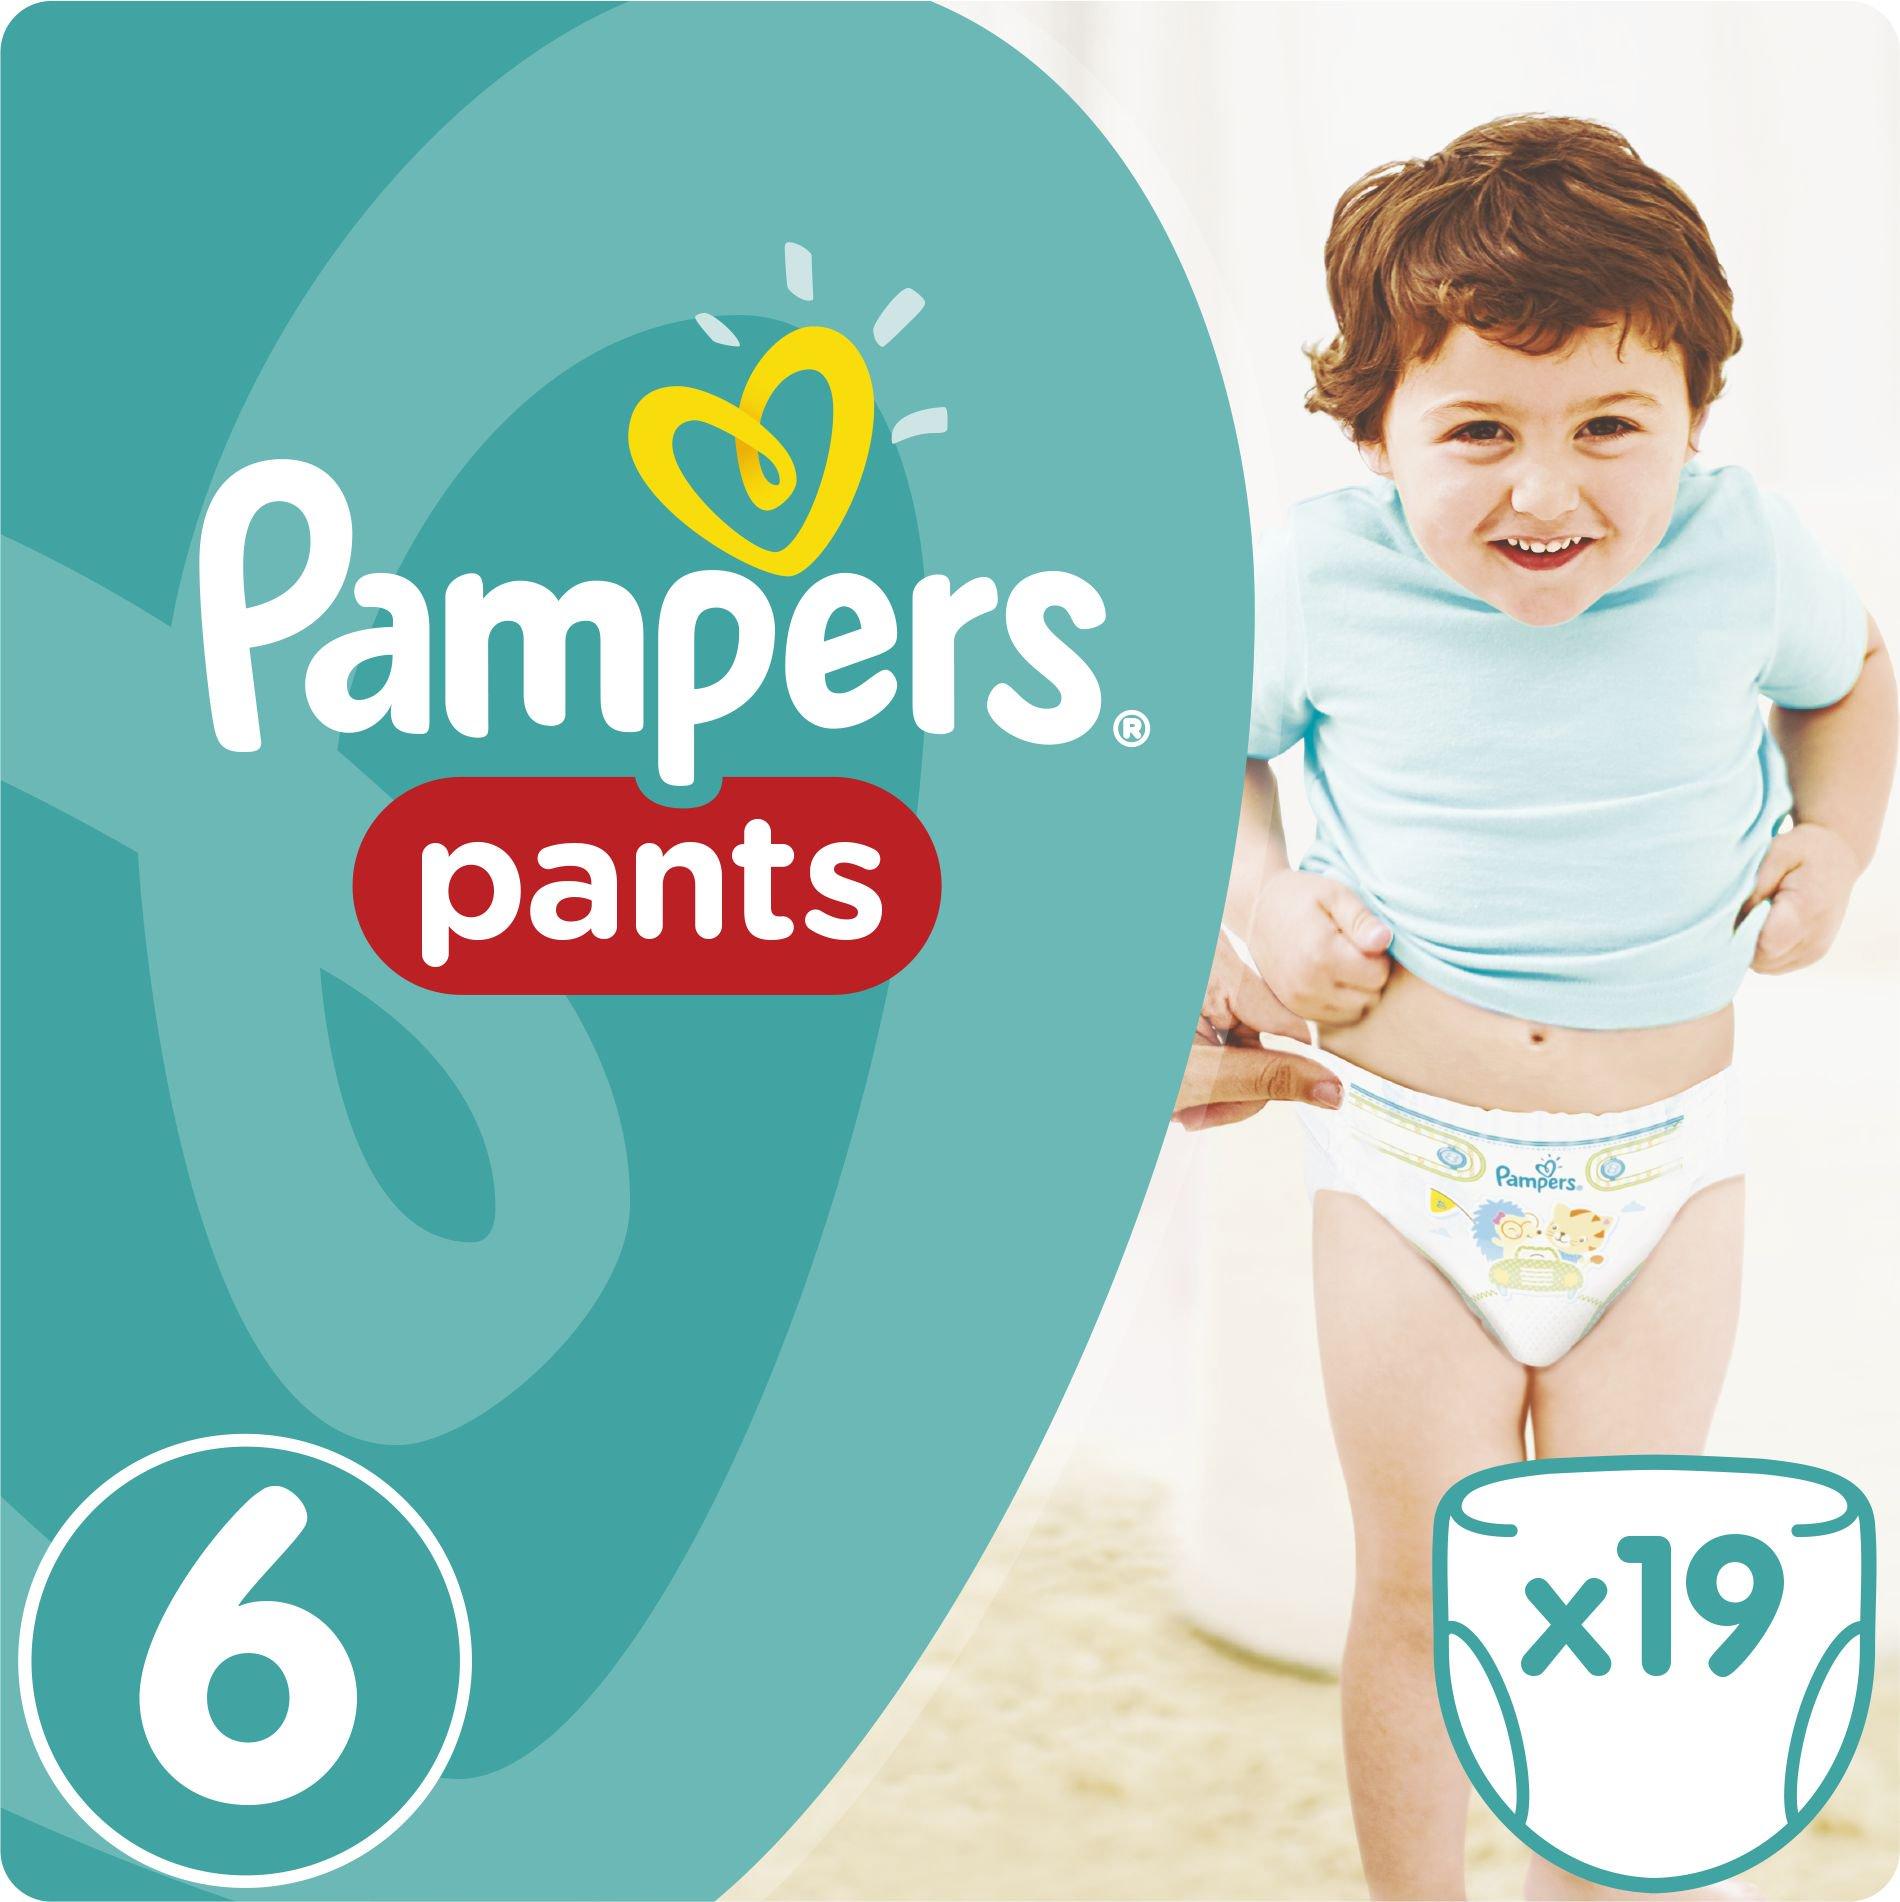 Pampers Pants Pieluchomajtki 6 Extra Large 19 Szt. (673378) 673378